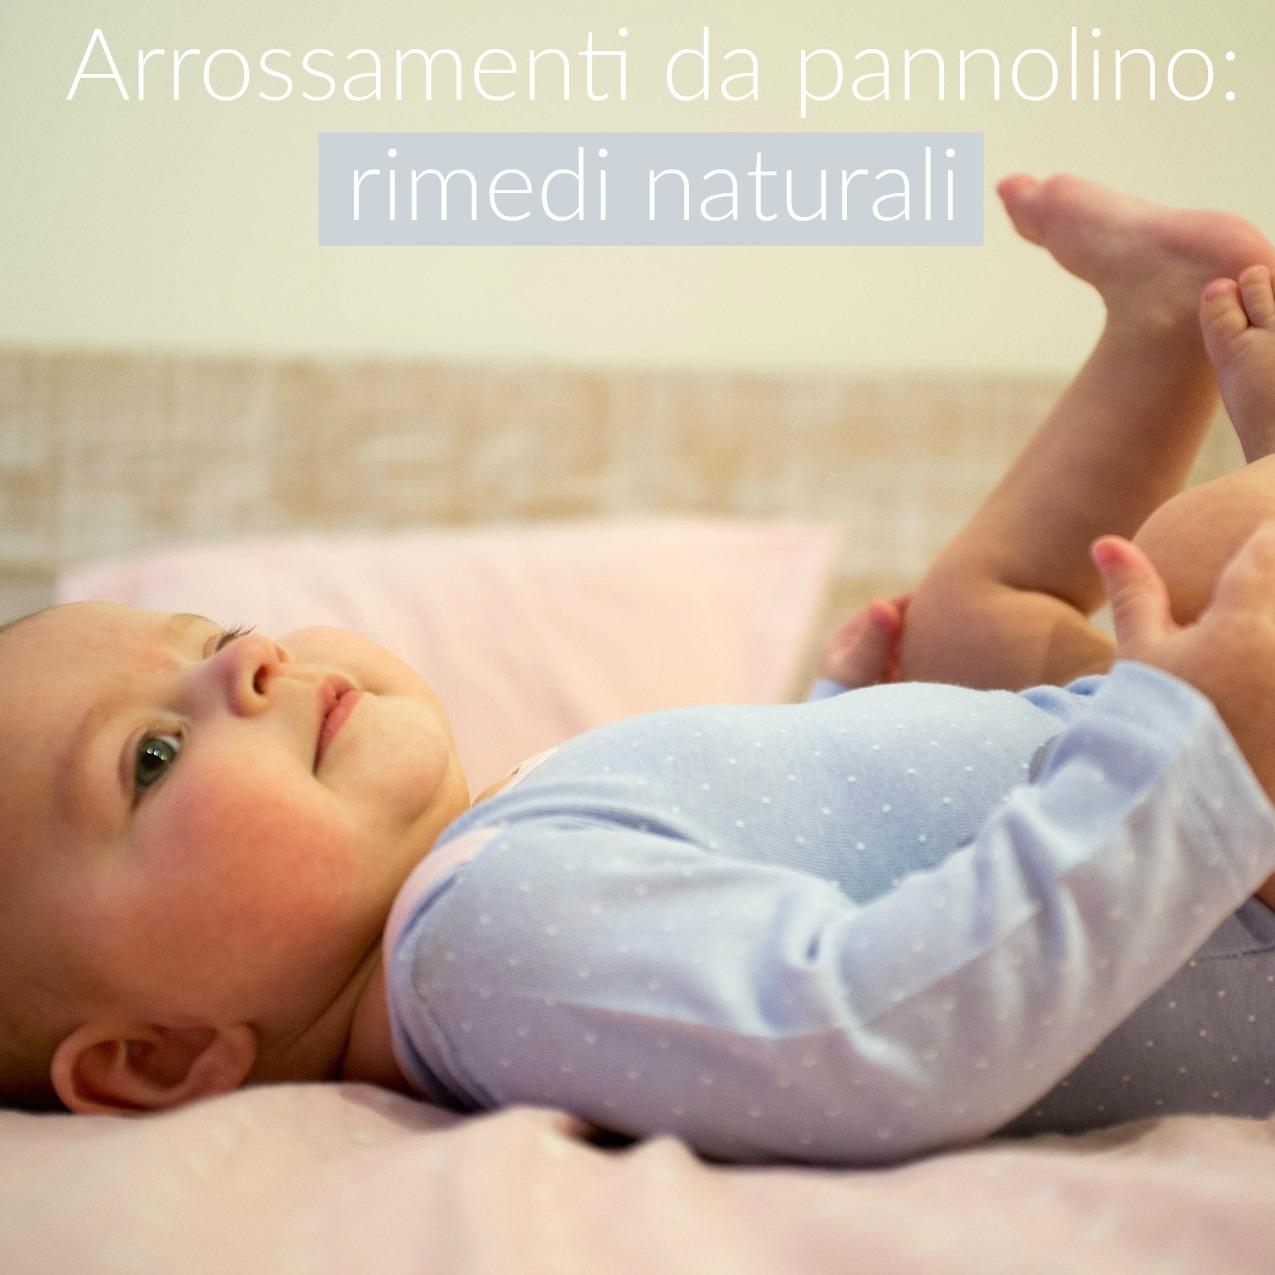 arrossamenti-pannolino-rimedi-naturali-sq